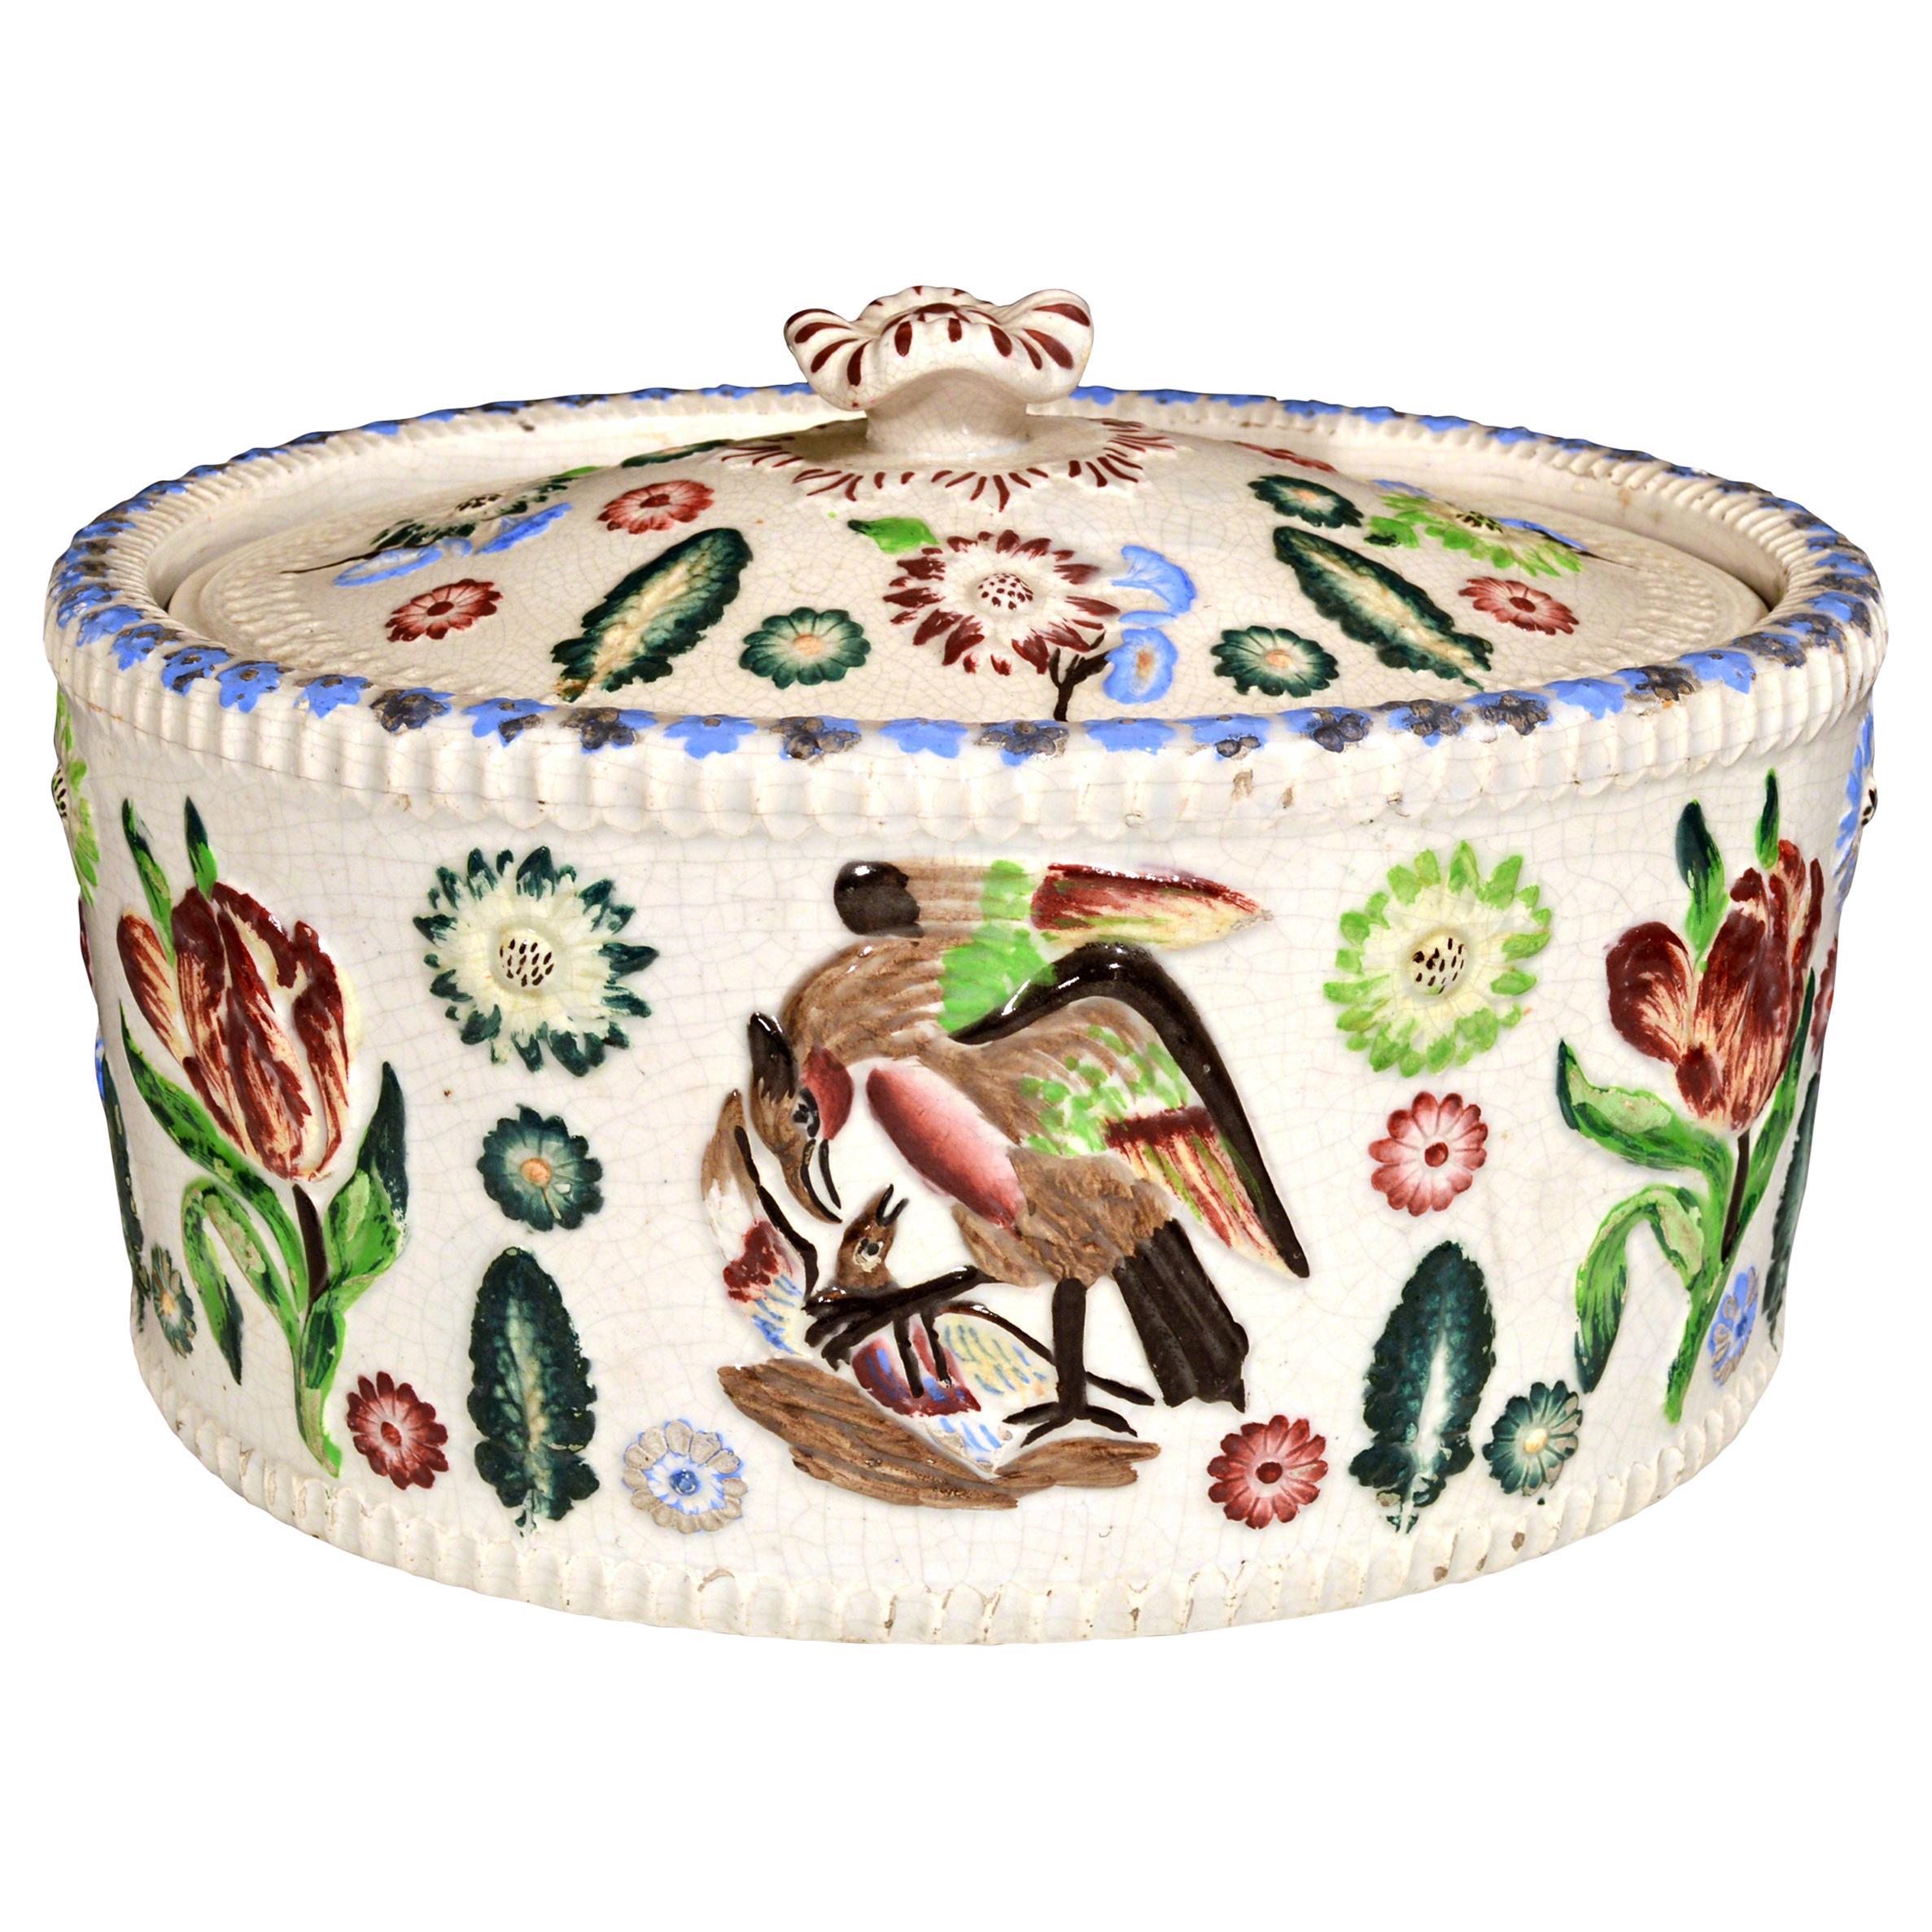 English Pottery Game Tureen, 19th Century